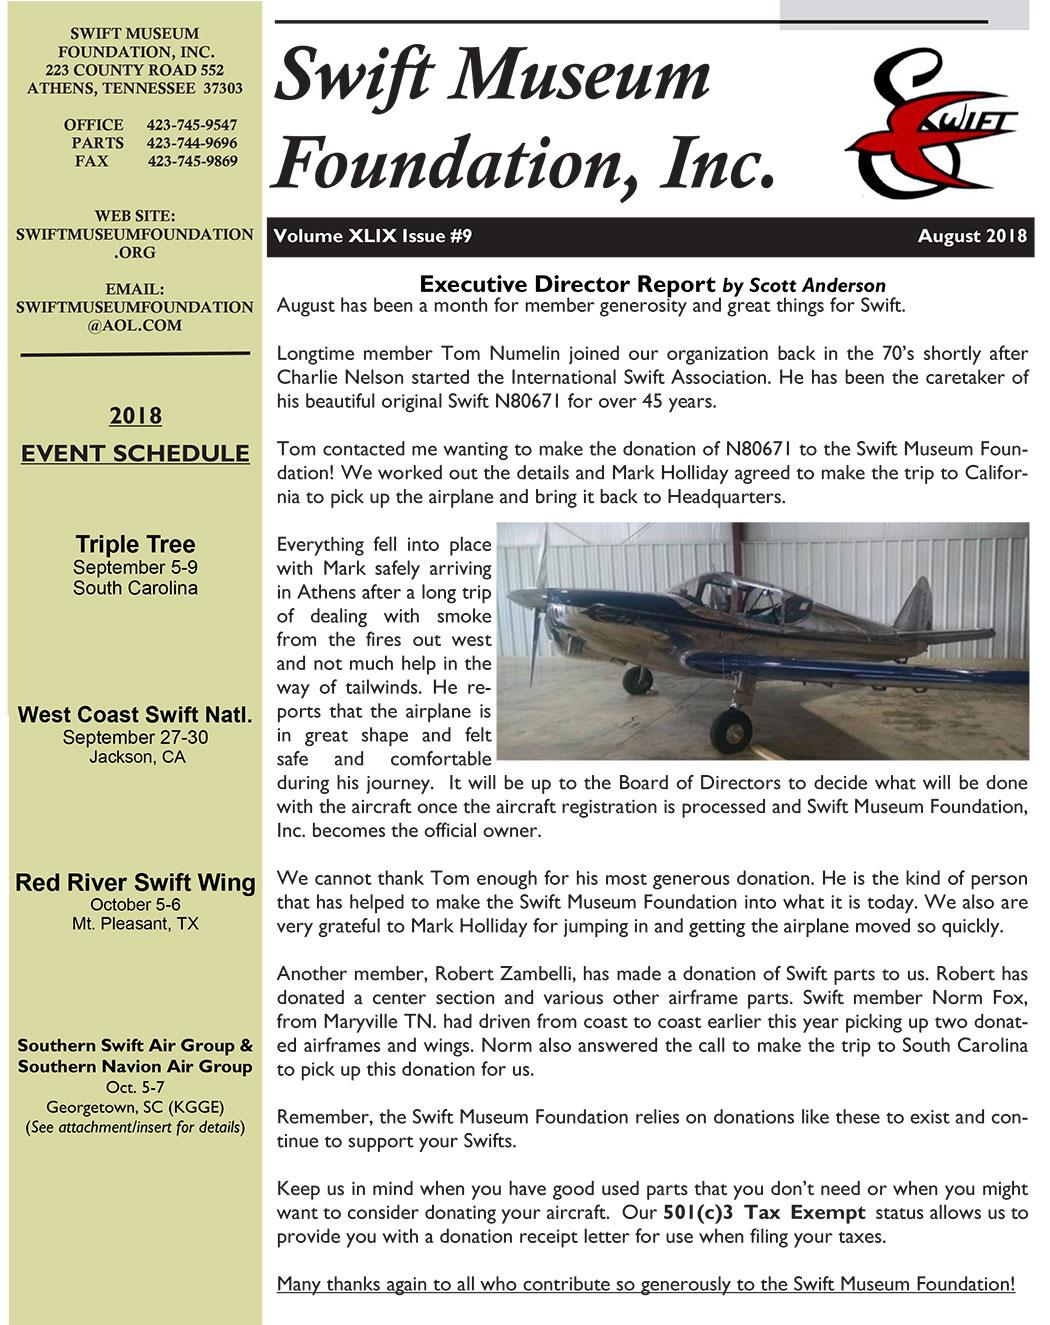 August 2018 Swift Museum Foundation Newsletter - Swift Museum